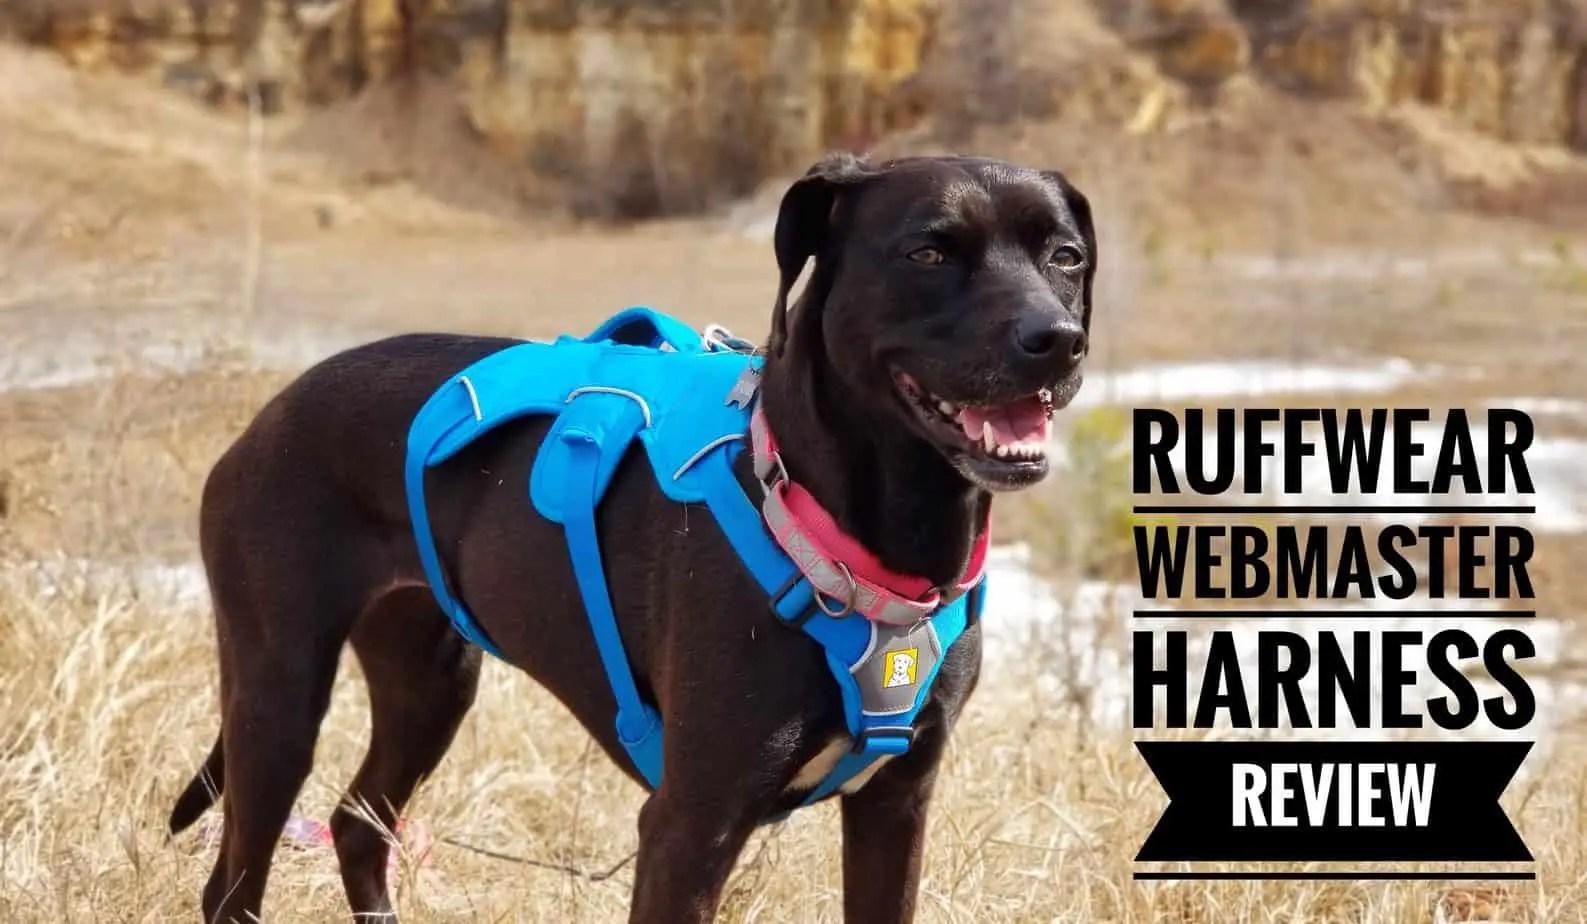 Ruffwear Webmaster Harness Review